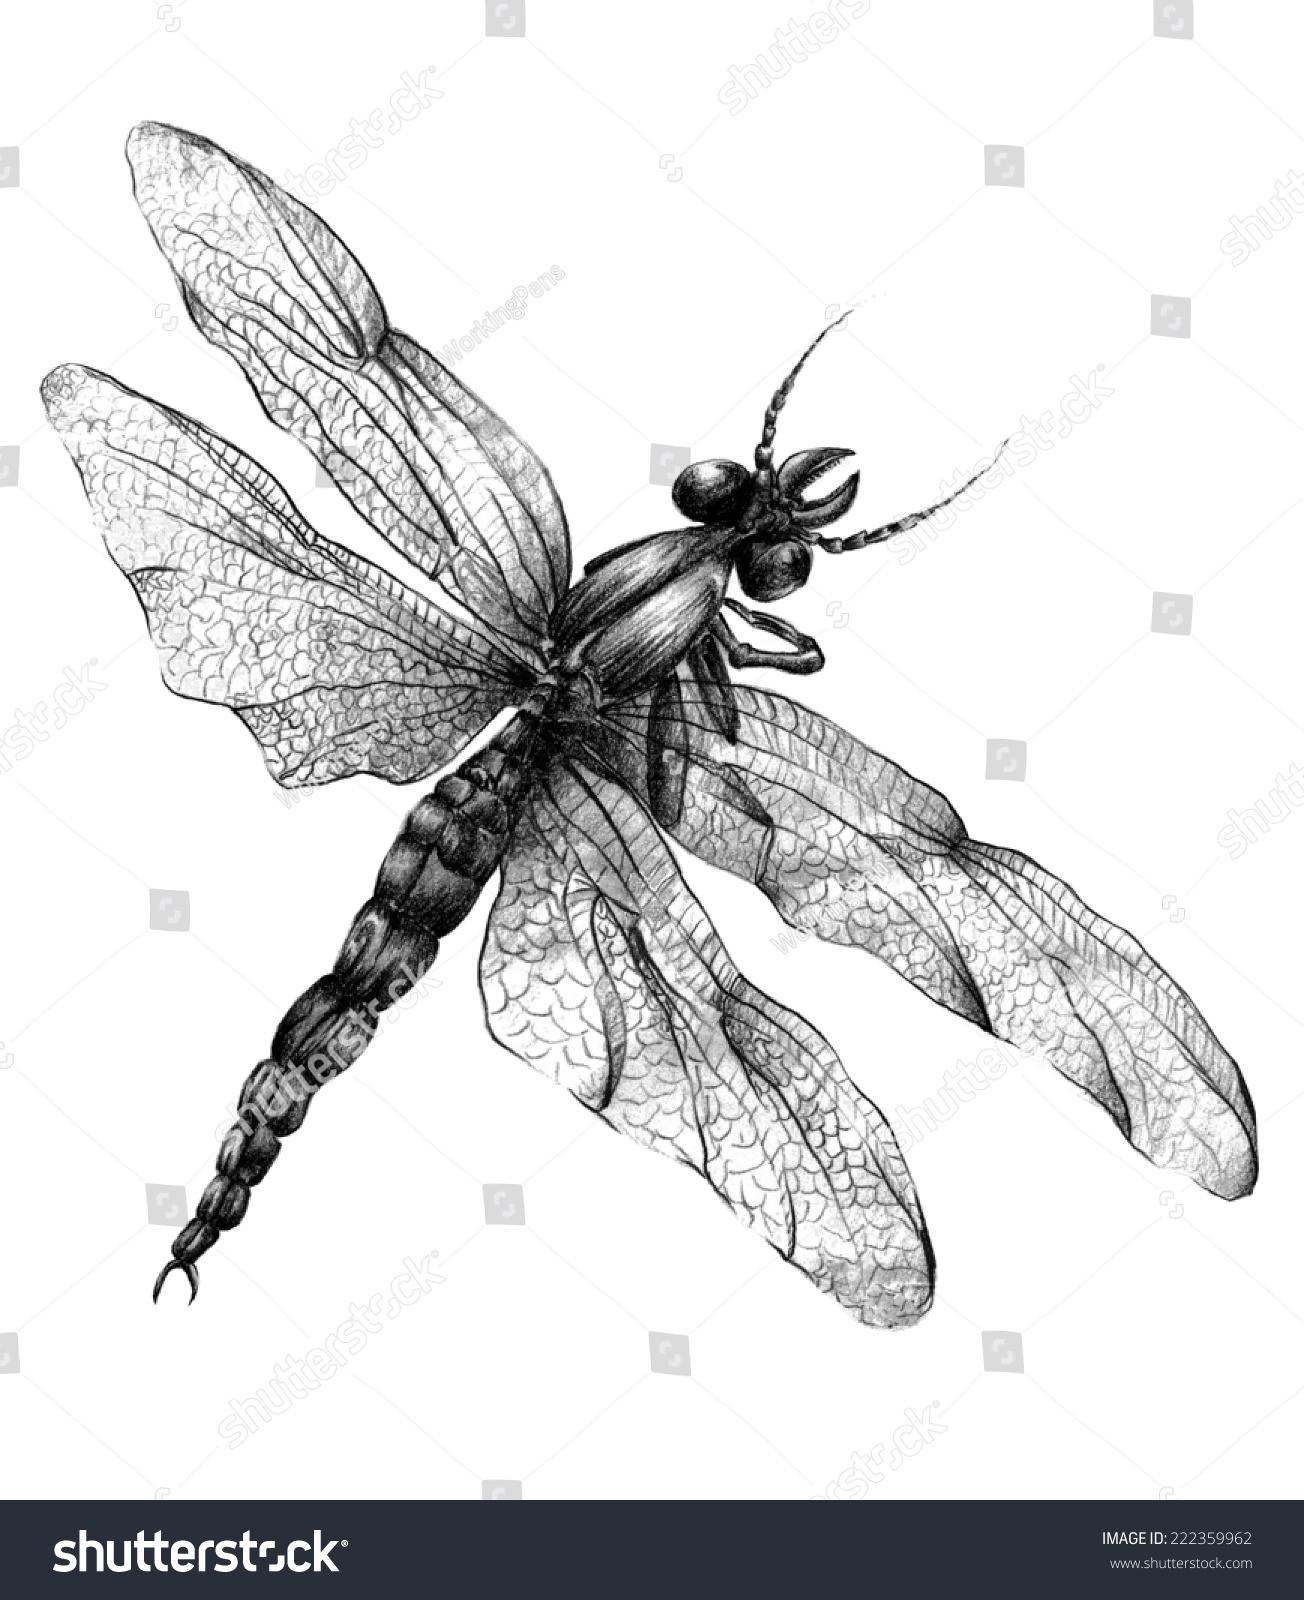 dragonflypencil drawingcharcoal black color stock illustration